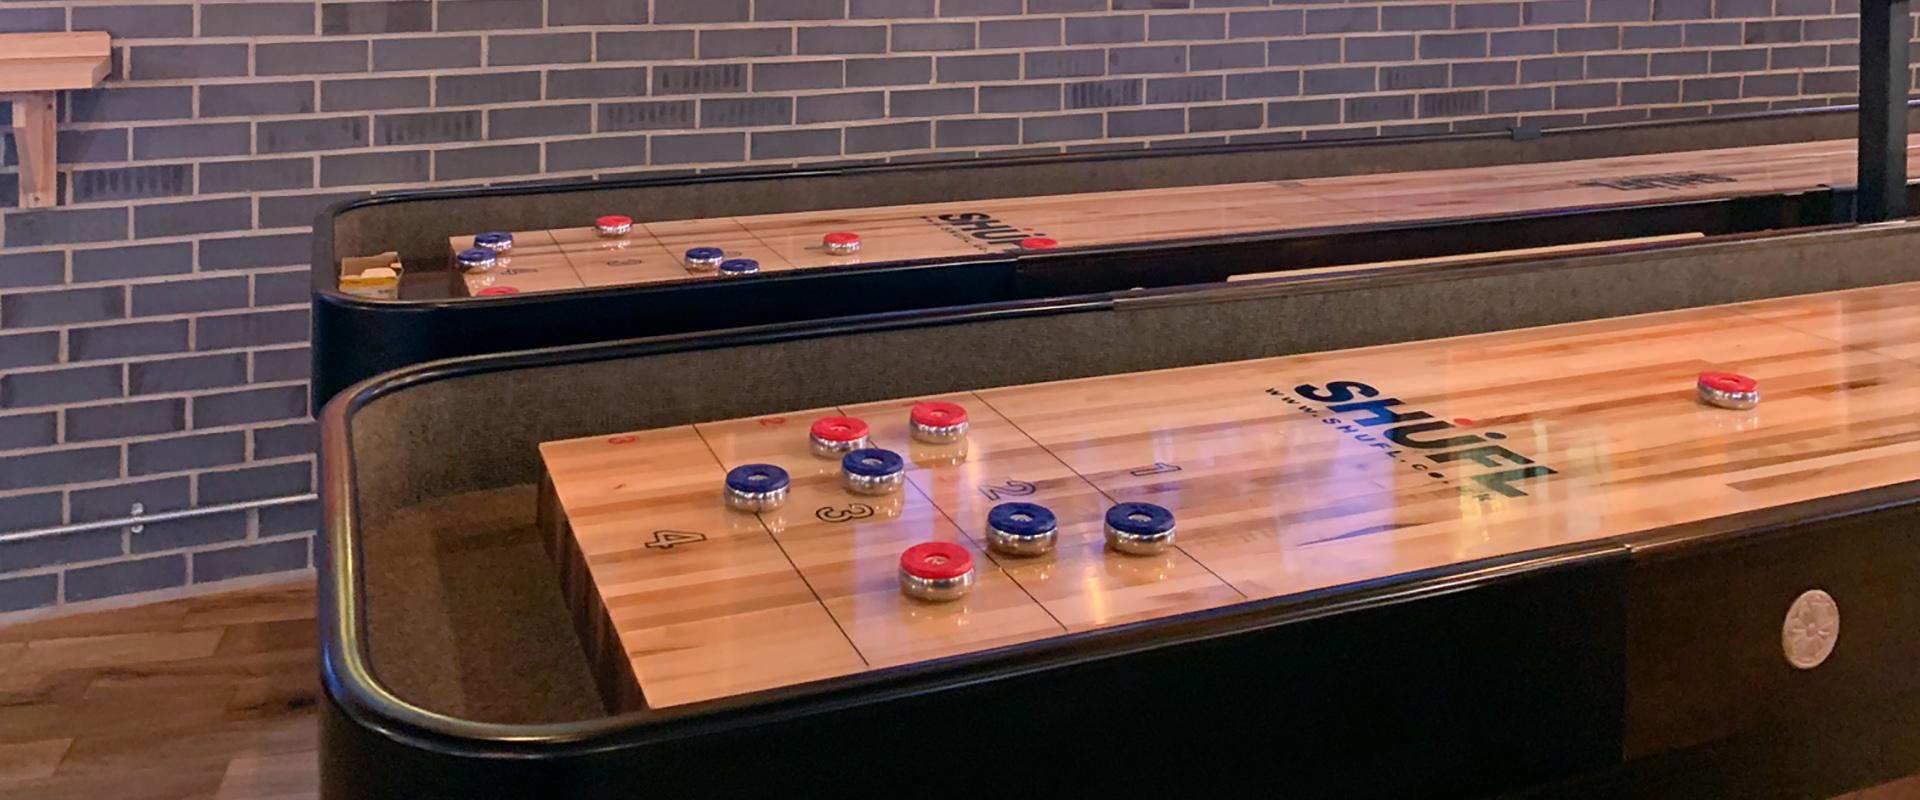 Shuffleboard at Sports Bar and Grill Marylebone